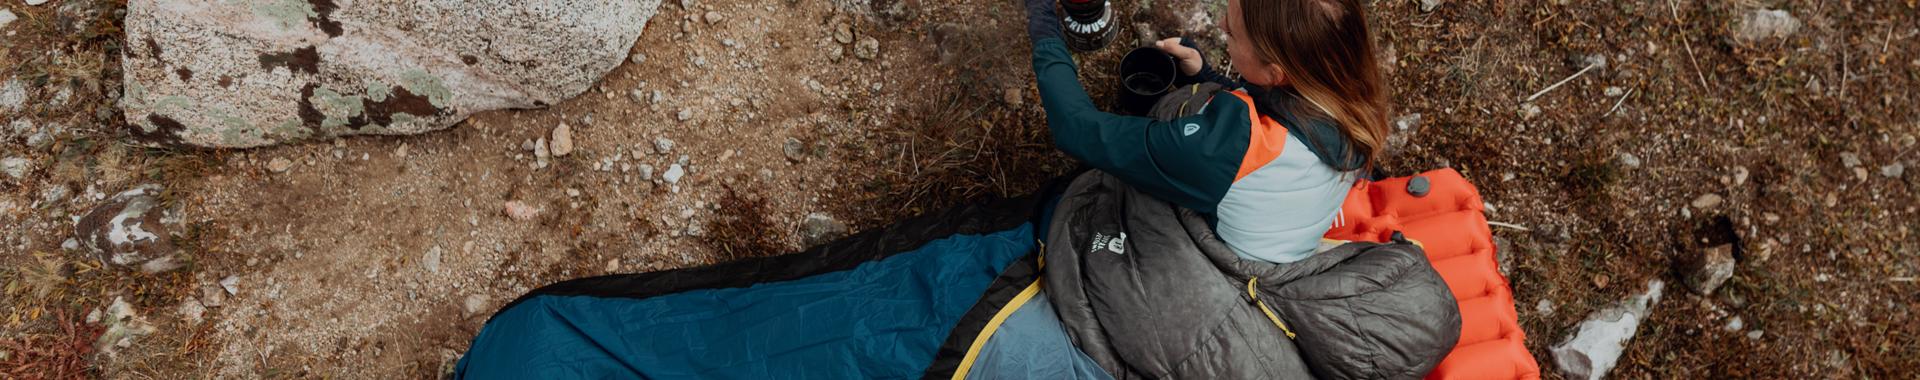 Woman making coffee while inside SD sleeping bag